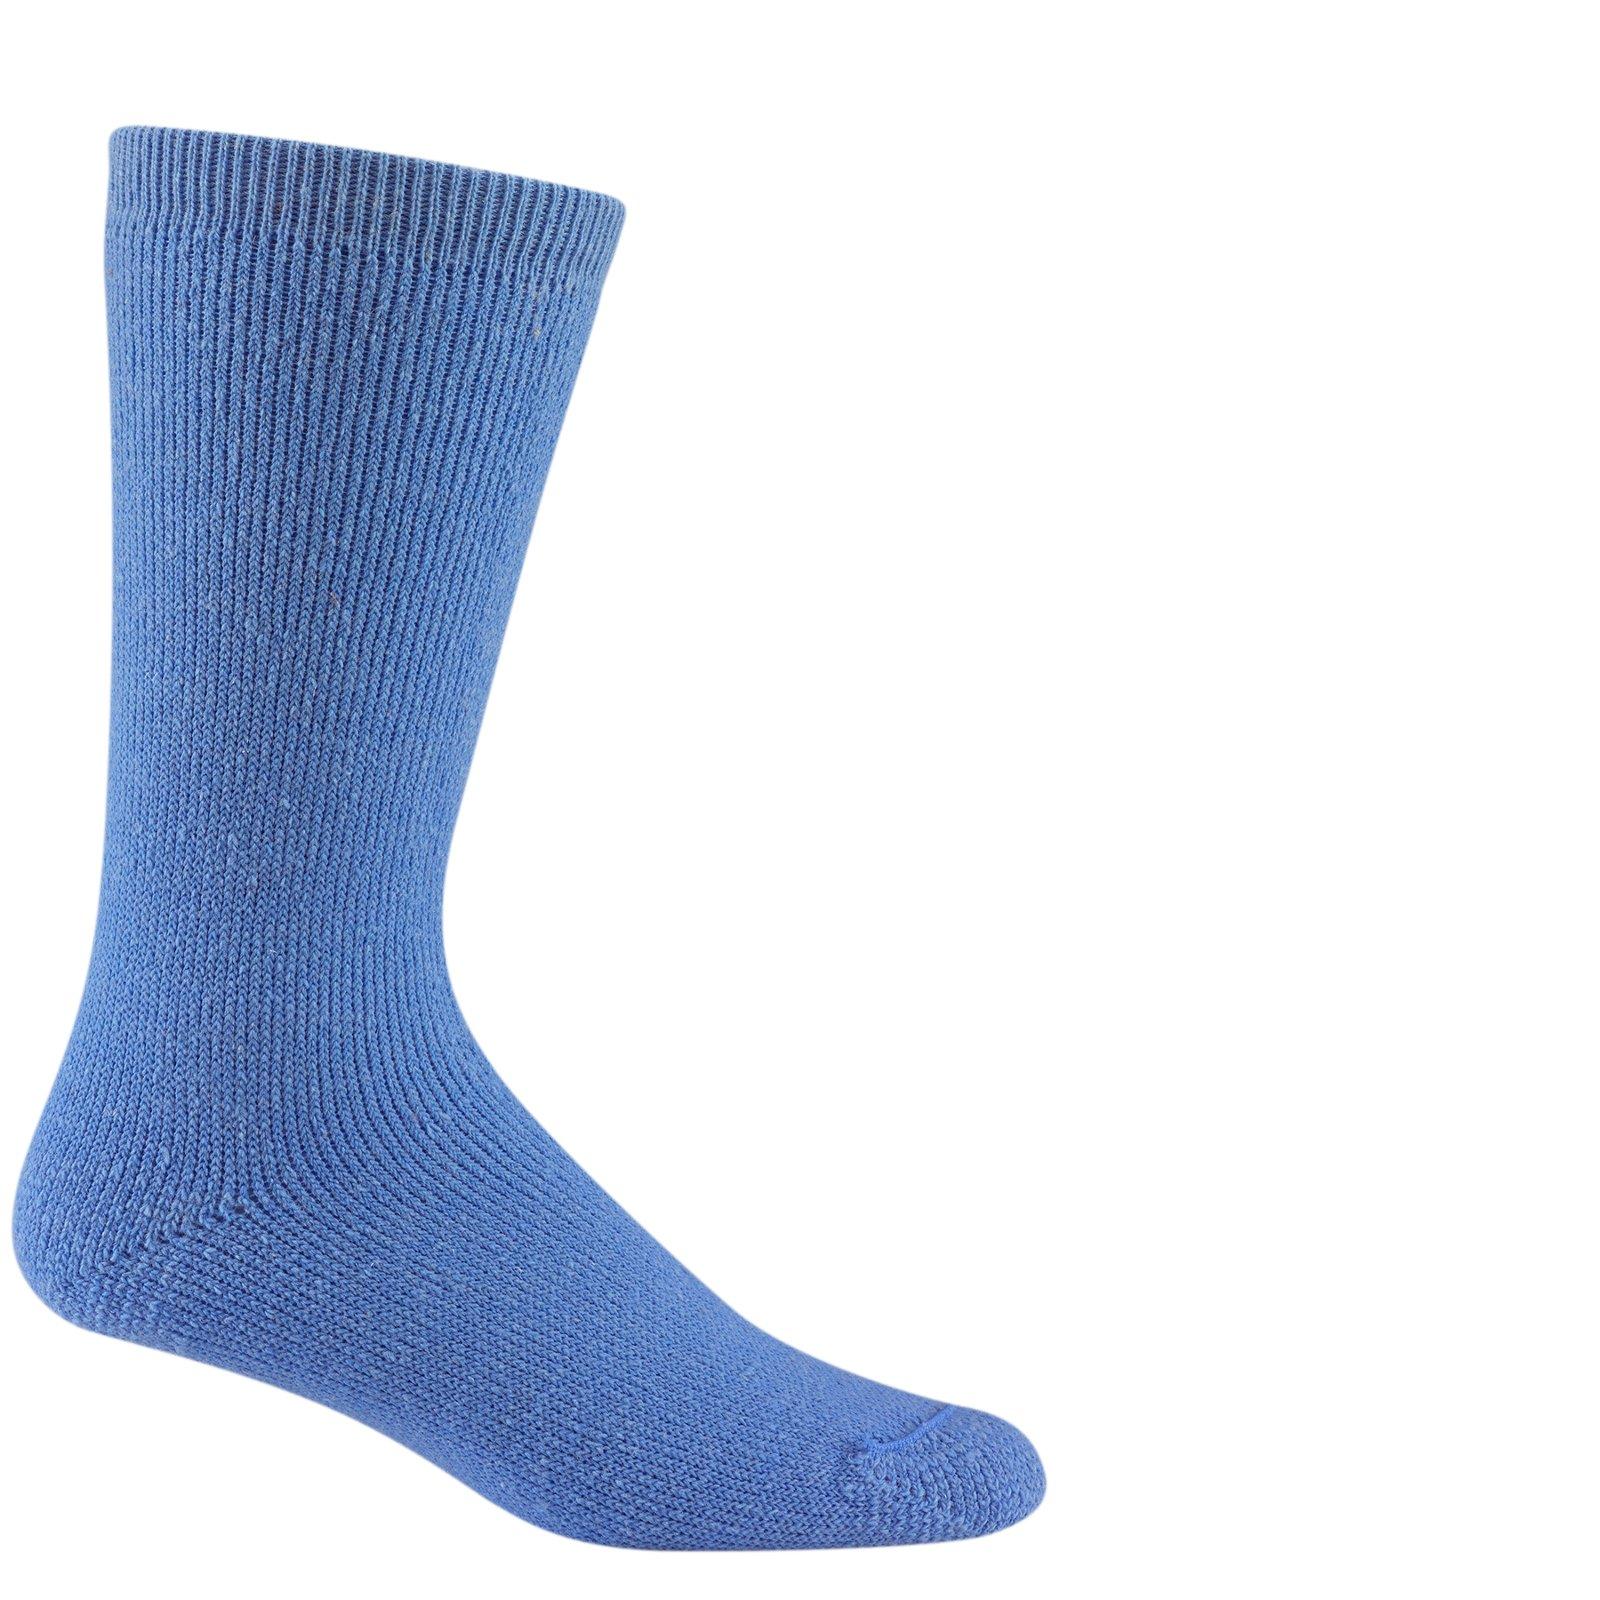 Wigwam 40 Below Socks Cornflower MD by Wigwam